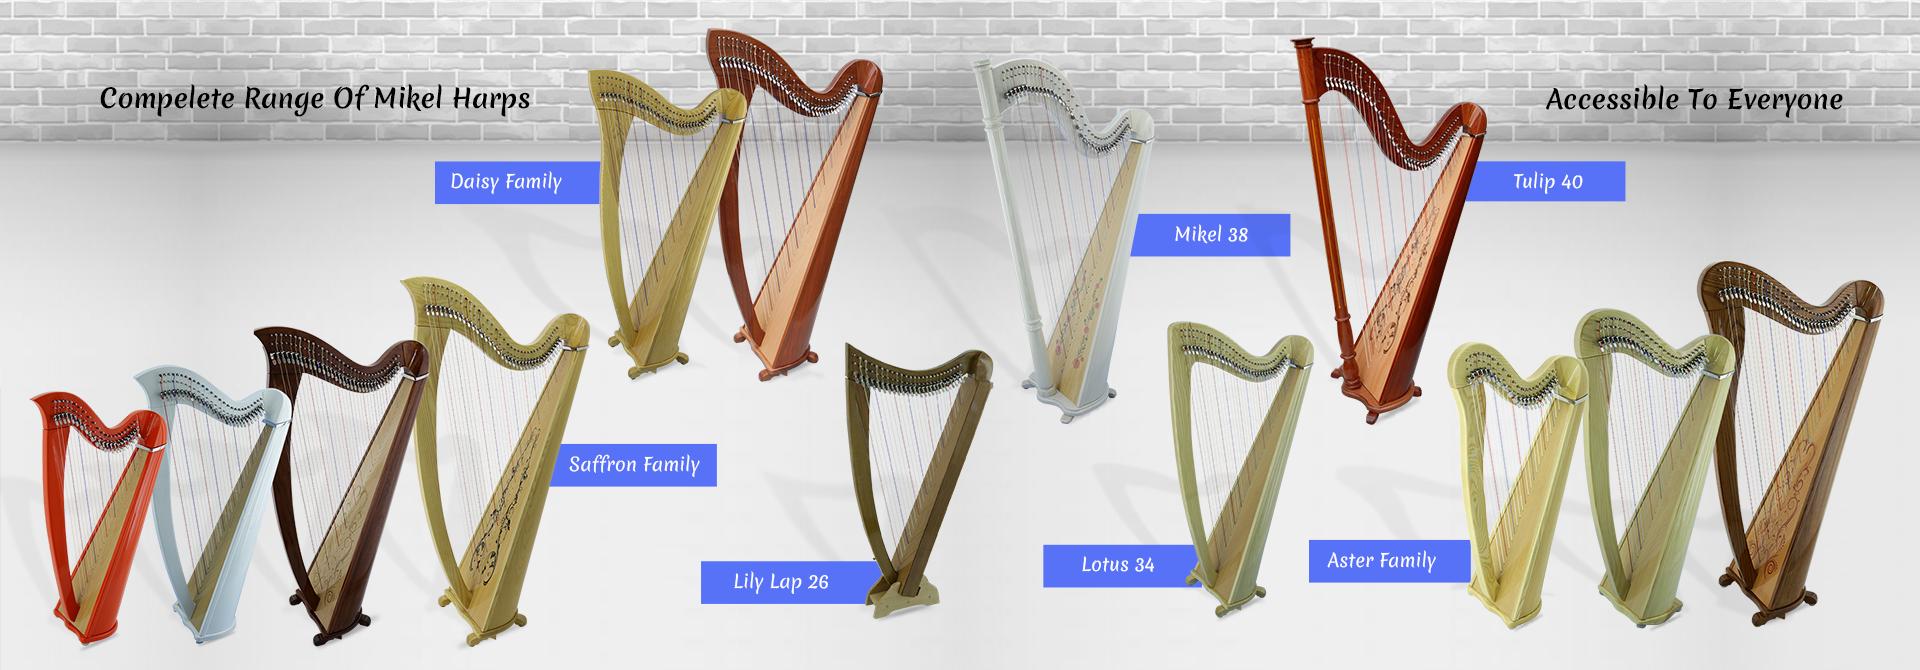 complete range of mikel harps